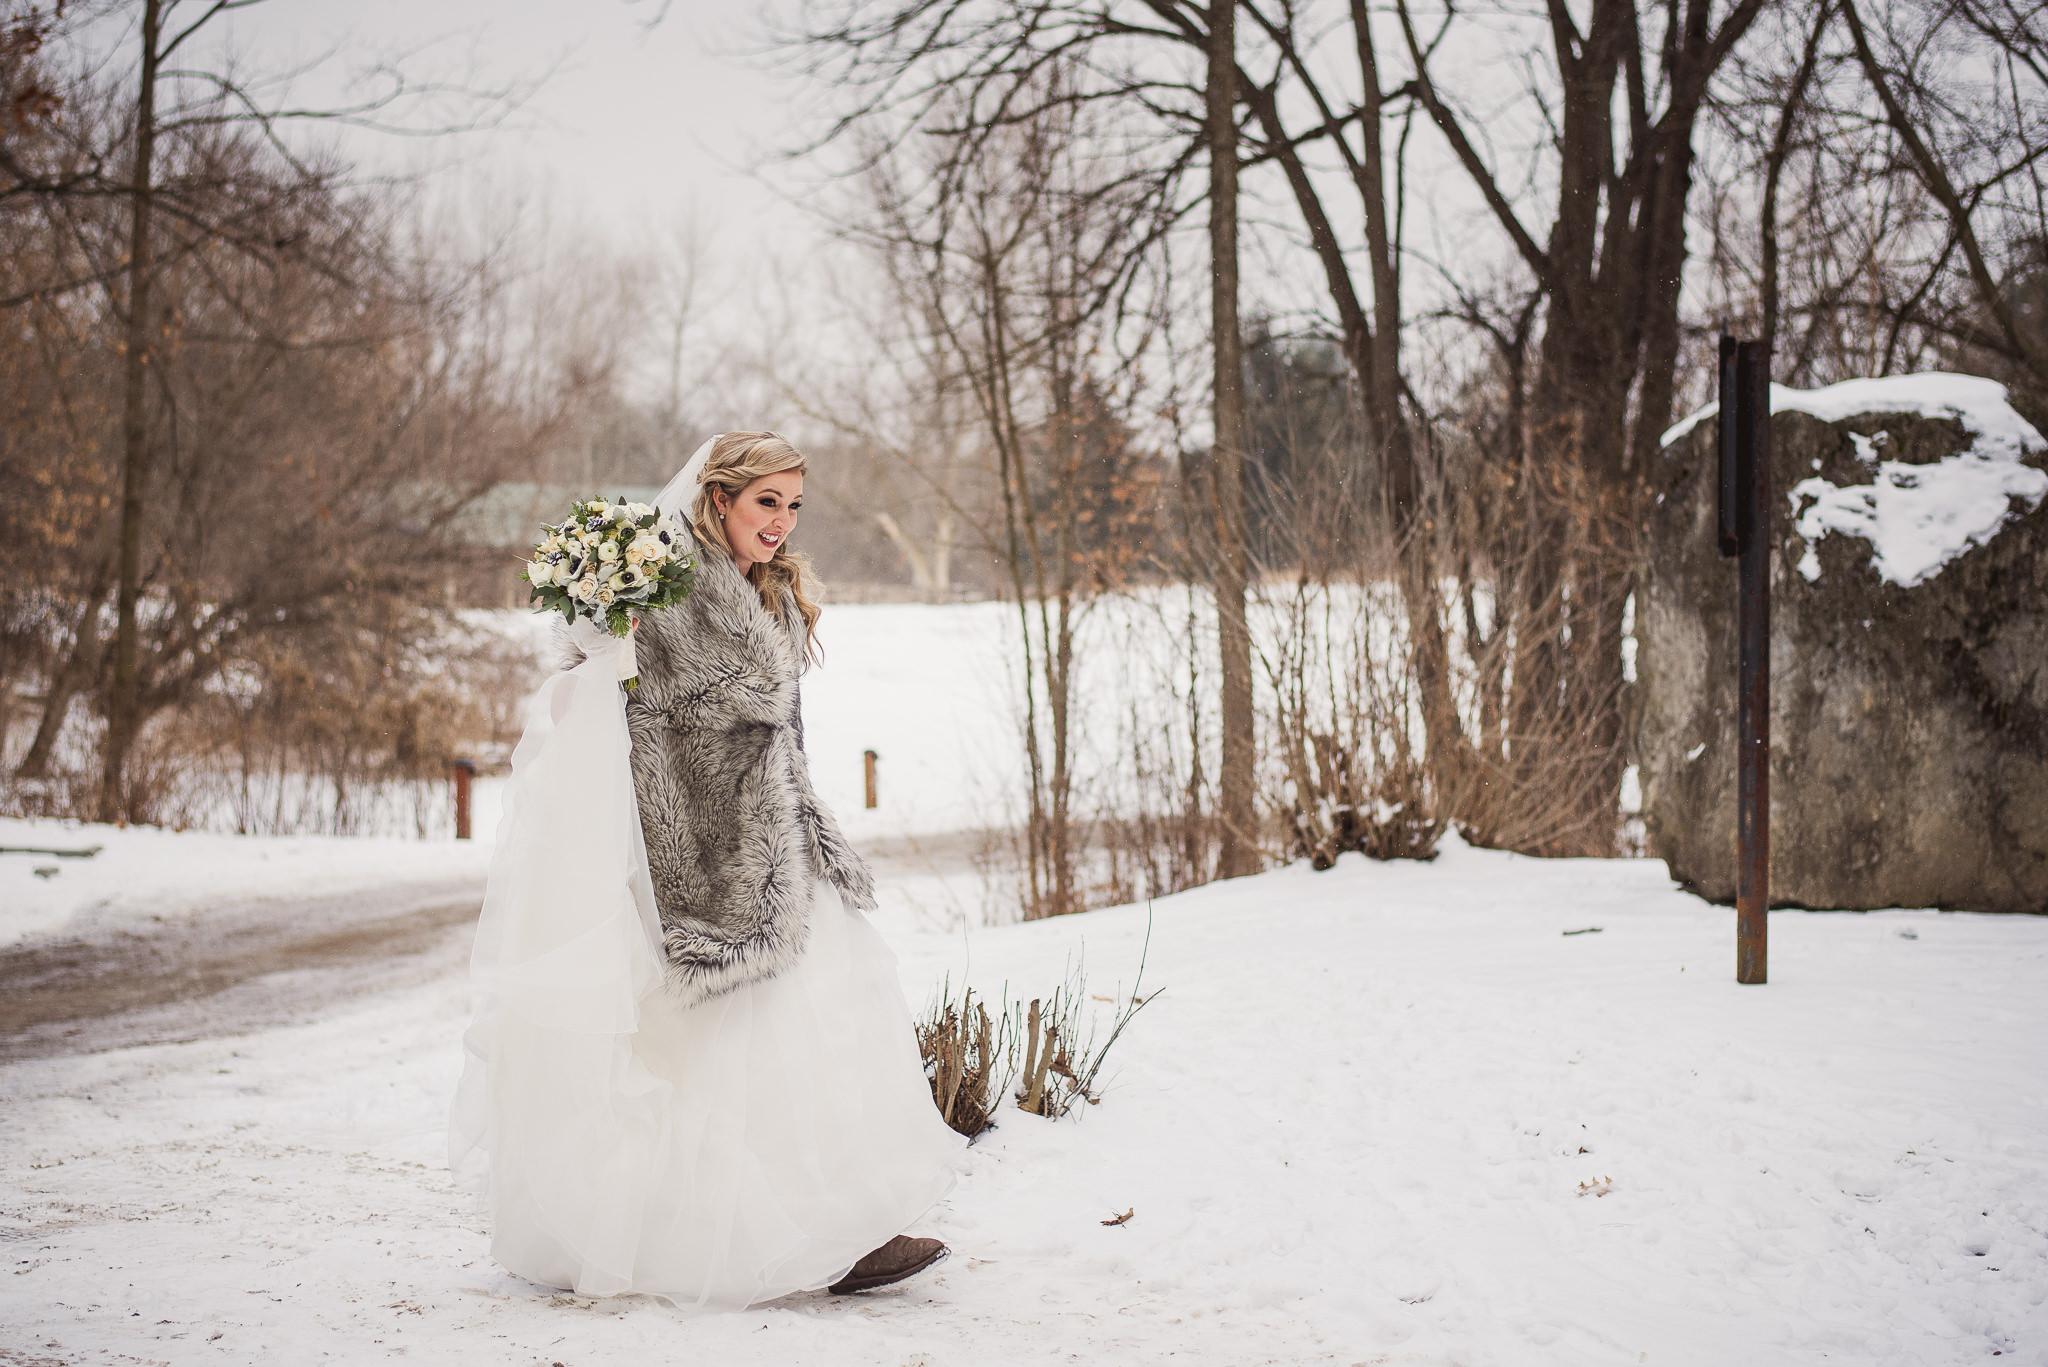 kortright center winter wedding photos 127 - Kortright Center Winter Wedding Photos